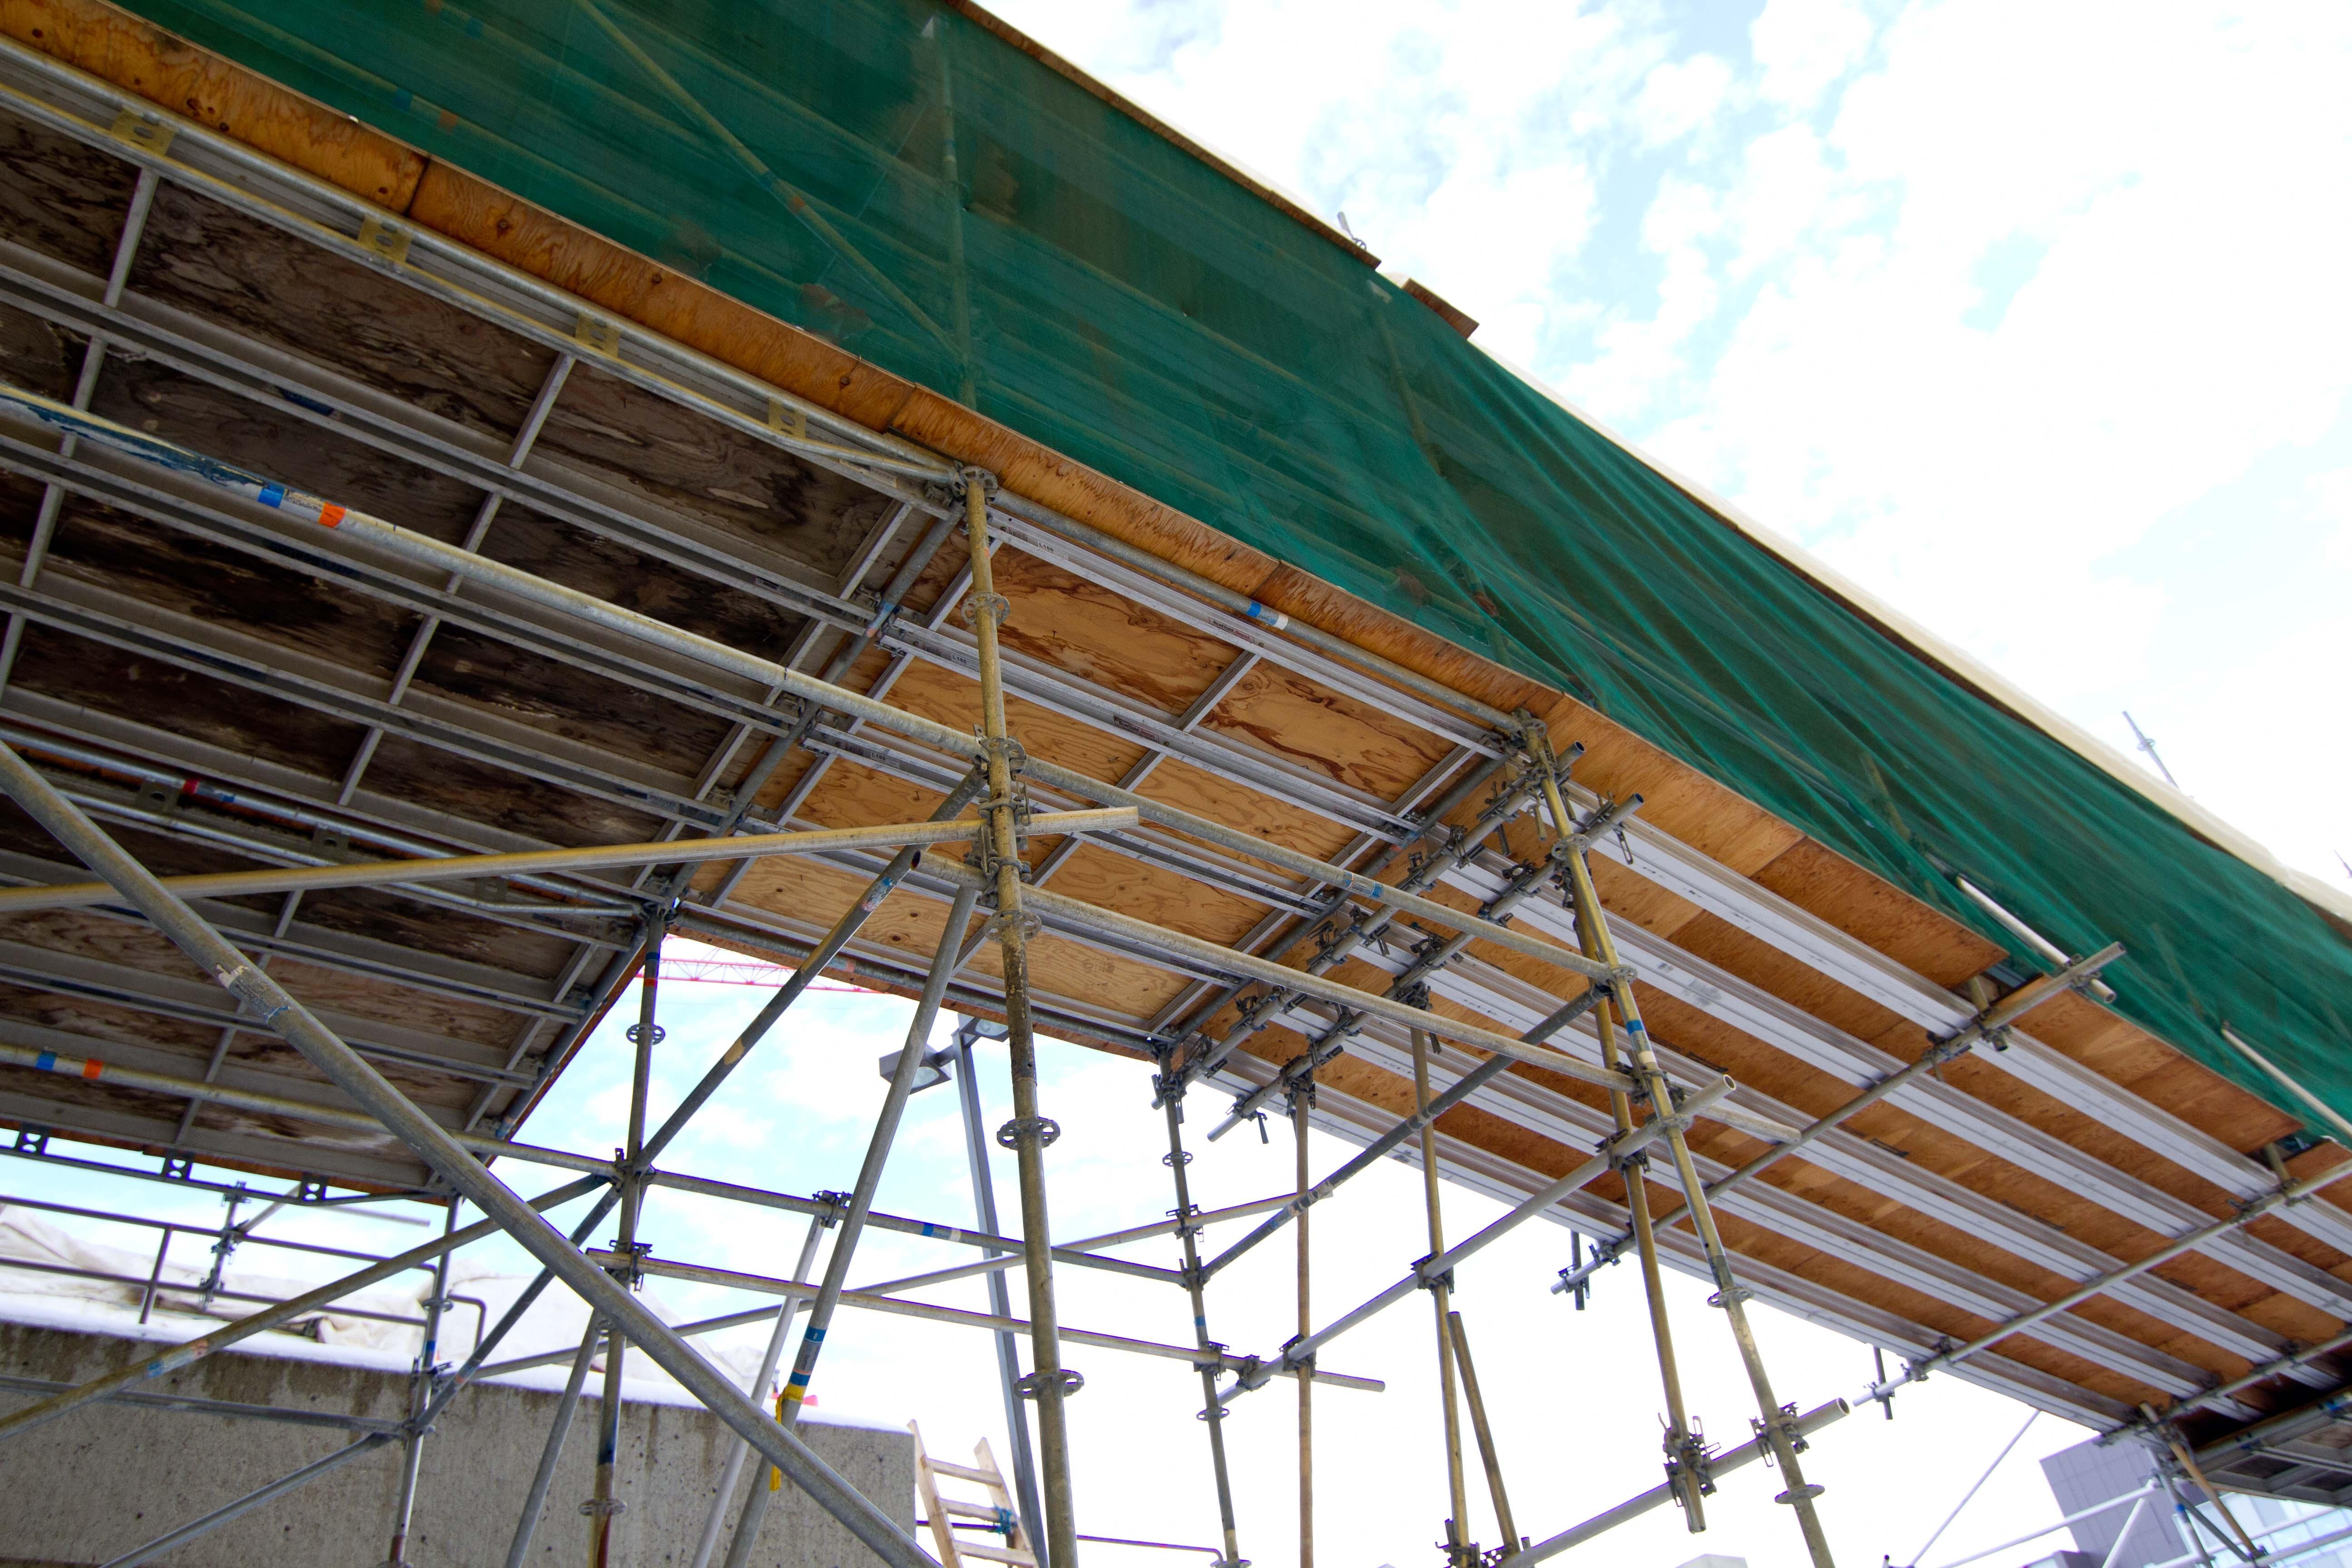 Gambar Atap Gudang Gang Balok Konstruksi Kanopi Peron Penglihatan Perancah Kayu Lapis Pencahayaan Struktur Luar Ruangan Penimbunan 5184x3456 1041160 Galeri Foto Pxhere